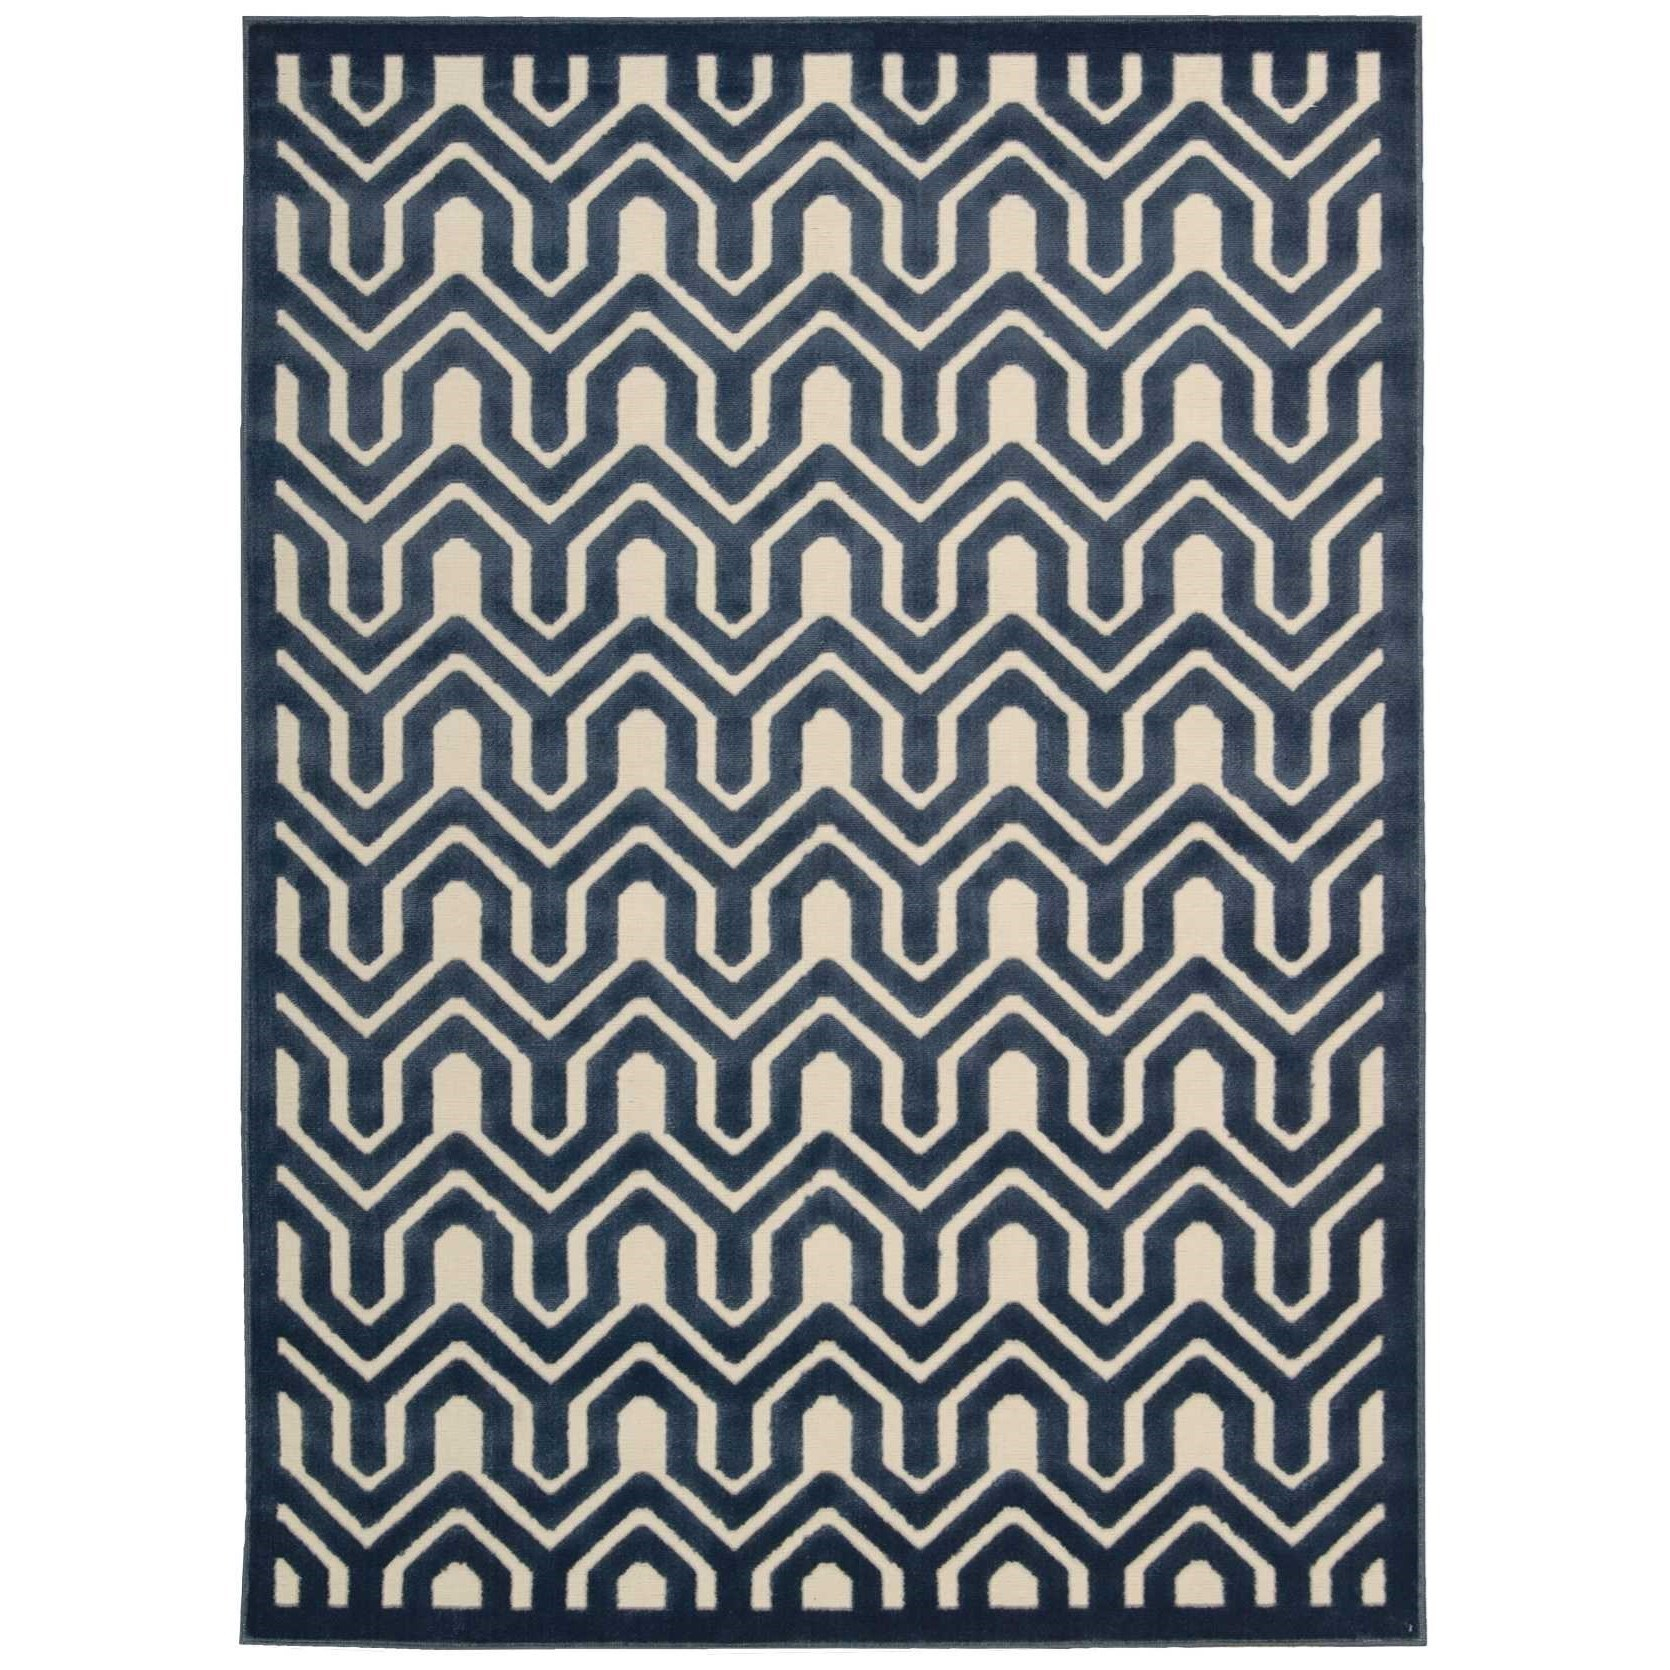 "Nourison Ultima 7'6"" x 9'6"" Ivory Blue Rectangle Rug - Item Number: UL316 IVBLU 76X96"